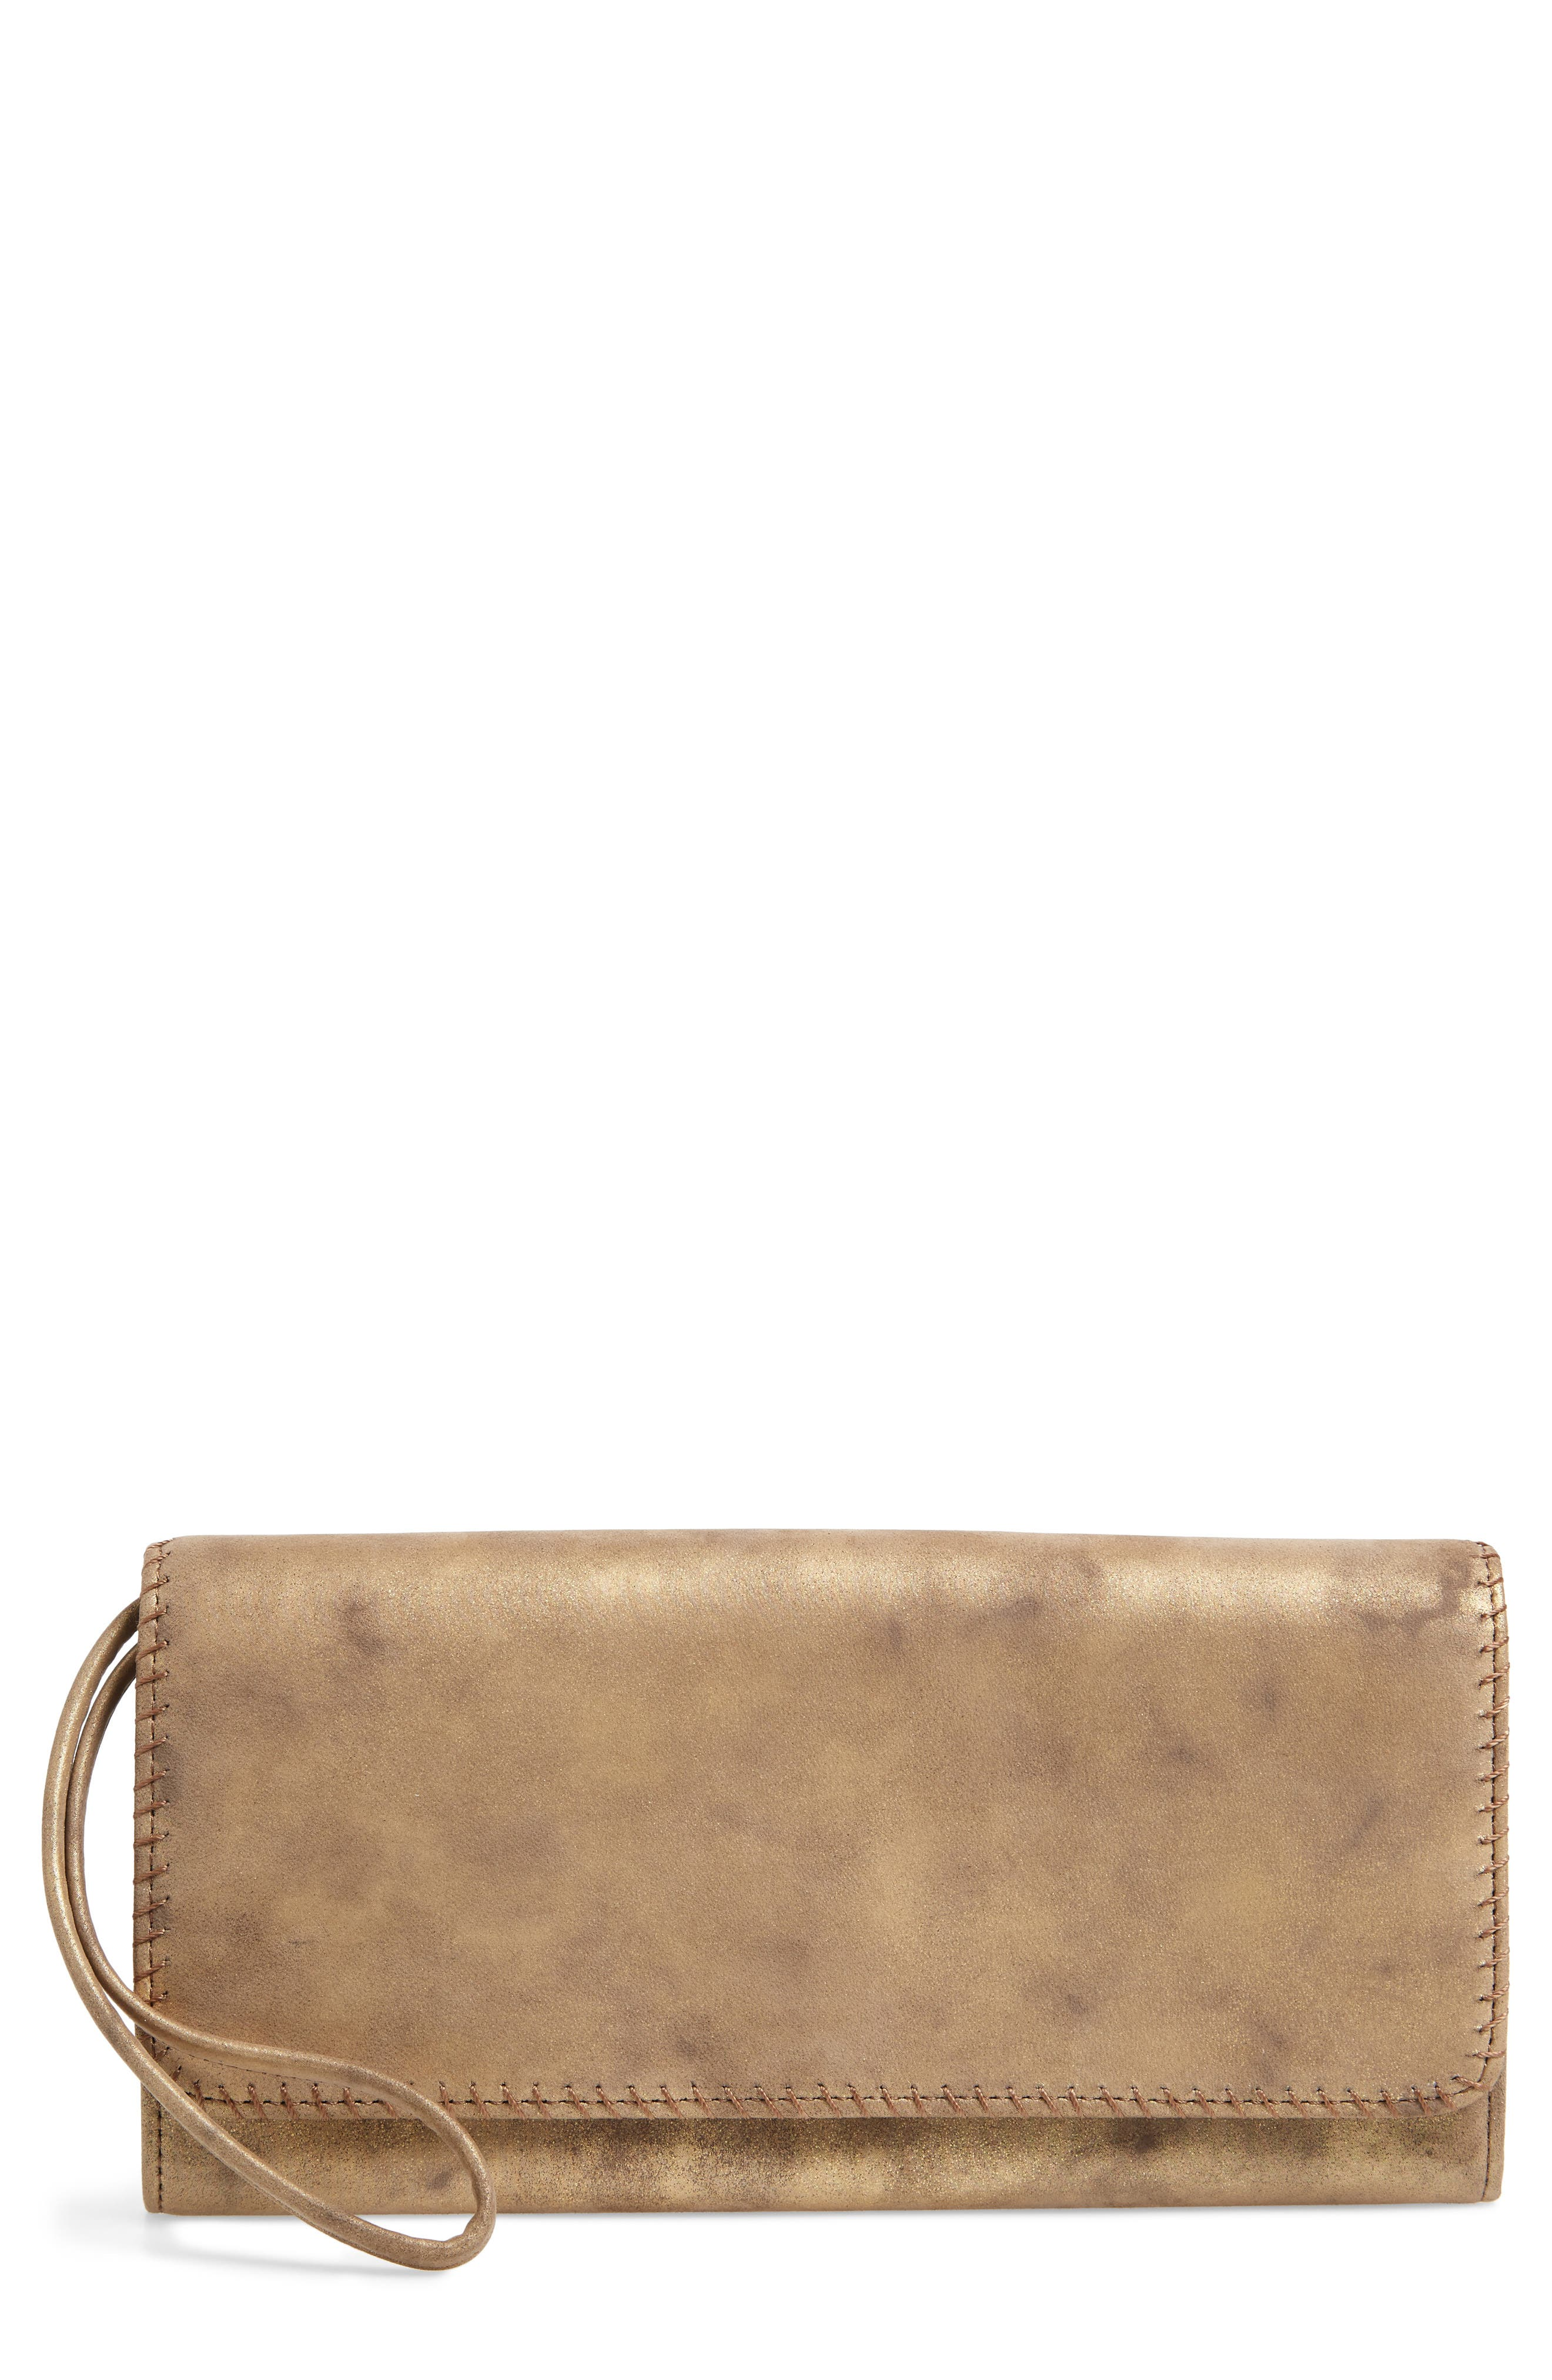 Era Wristie Leather Wallet,                         Main,                         color, Stardust